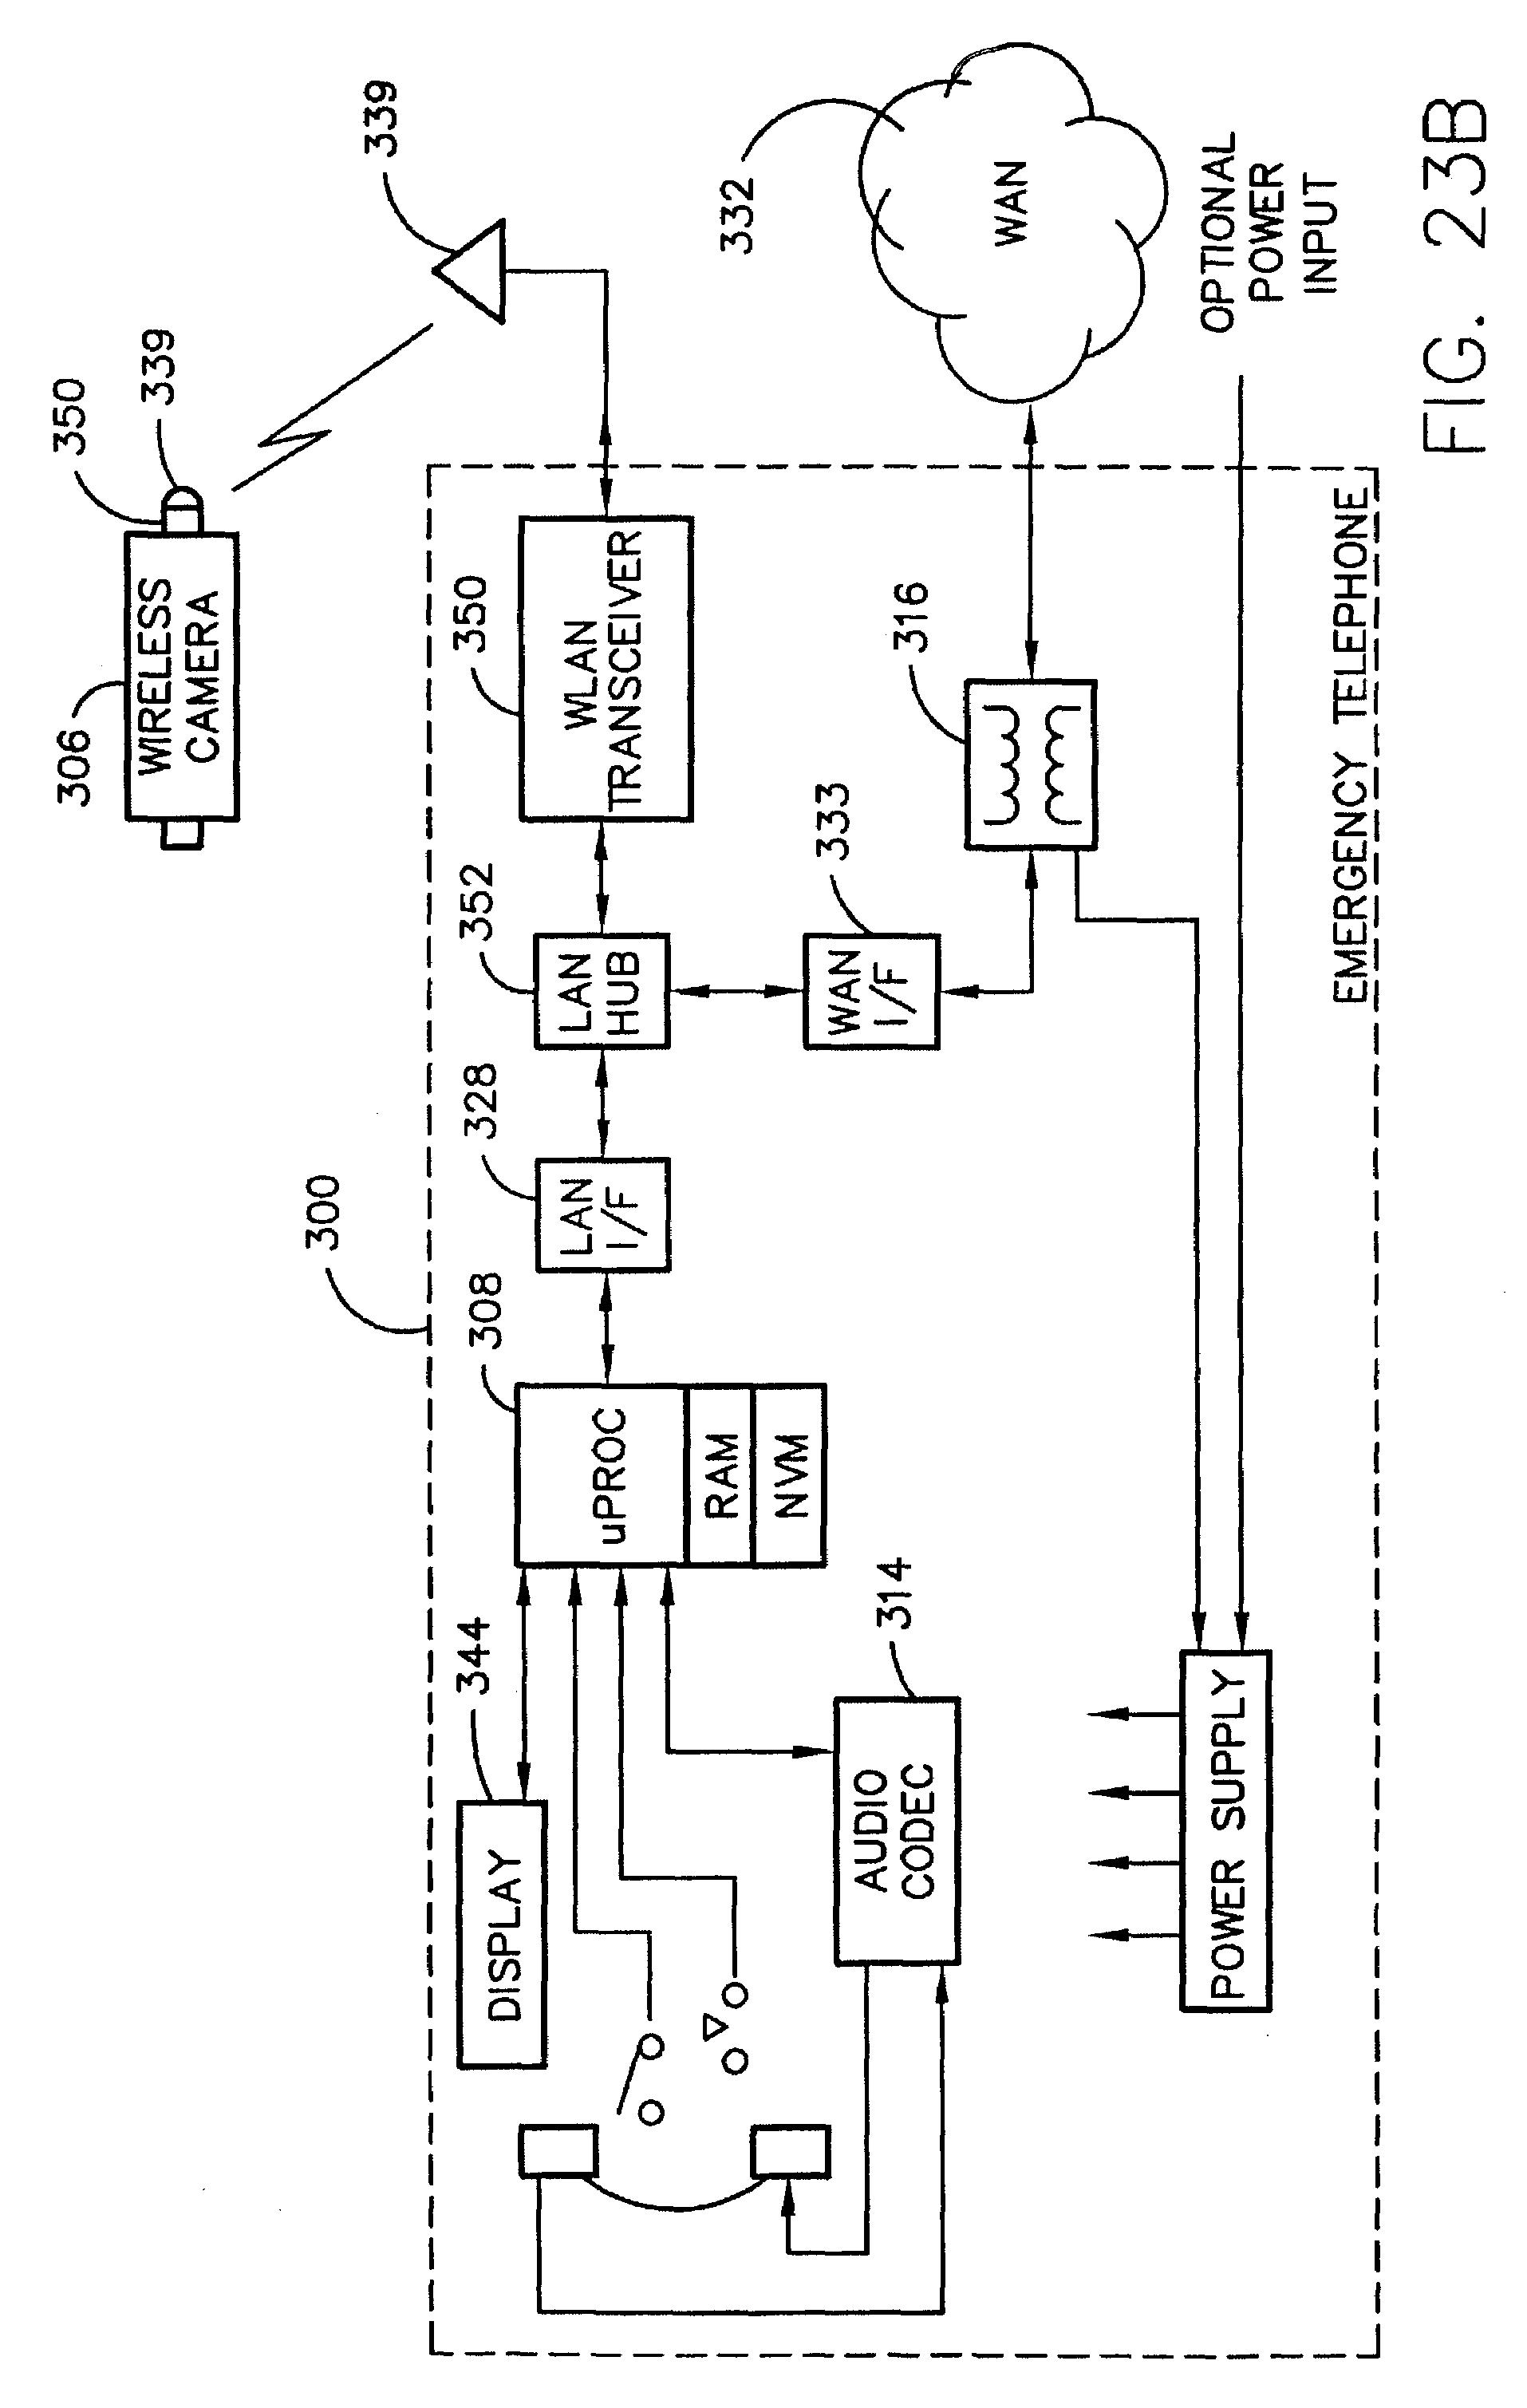 Patent Us 7428002 B2 Wireless Video Doorbell Circuit Basiccircuit Diagram Images